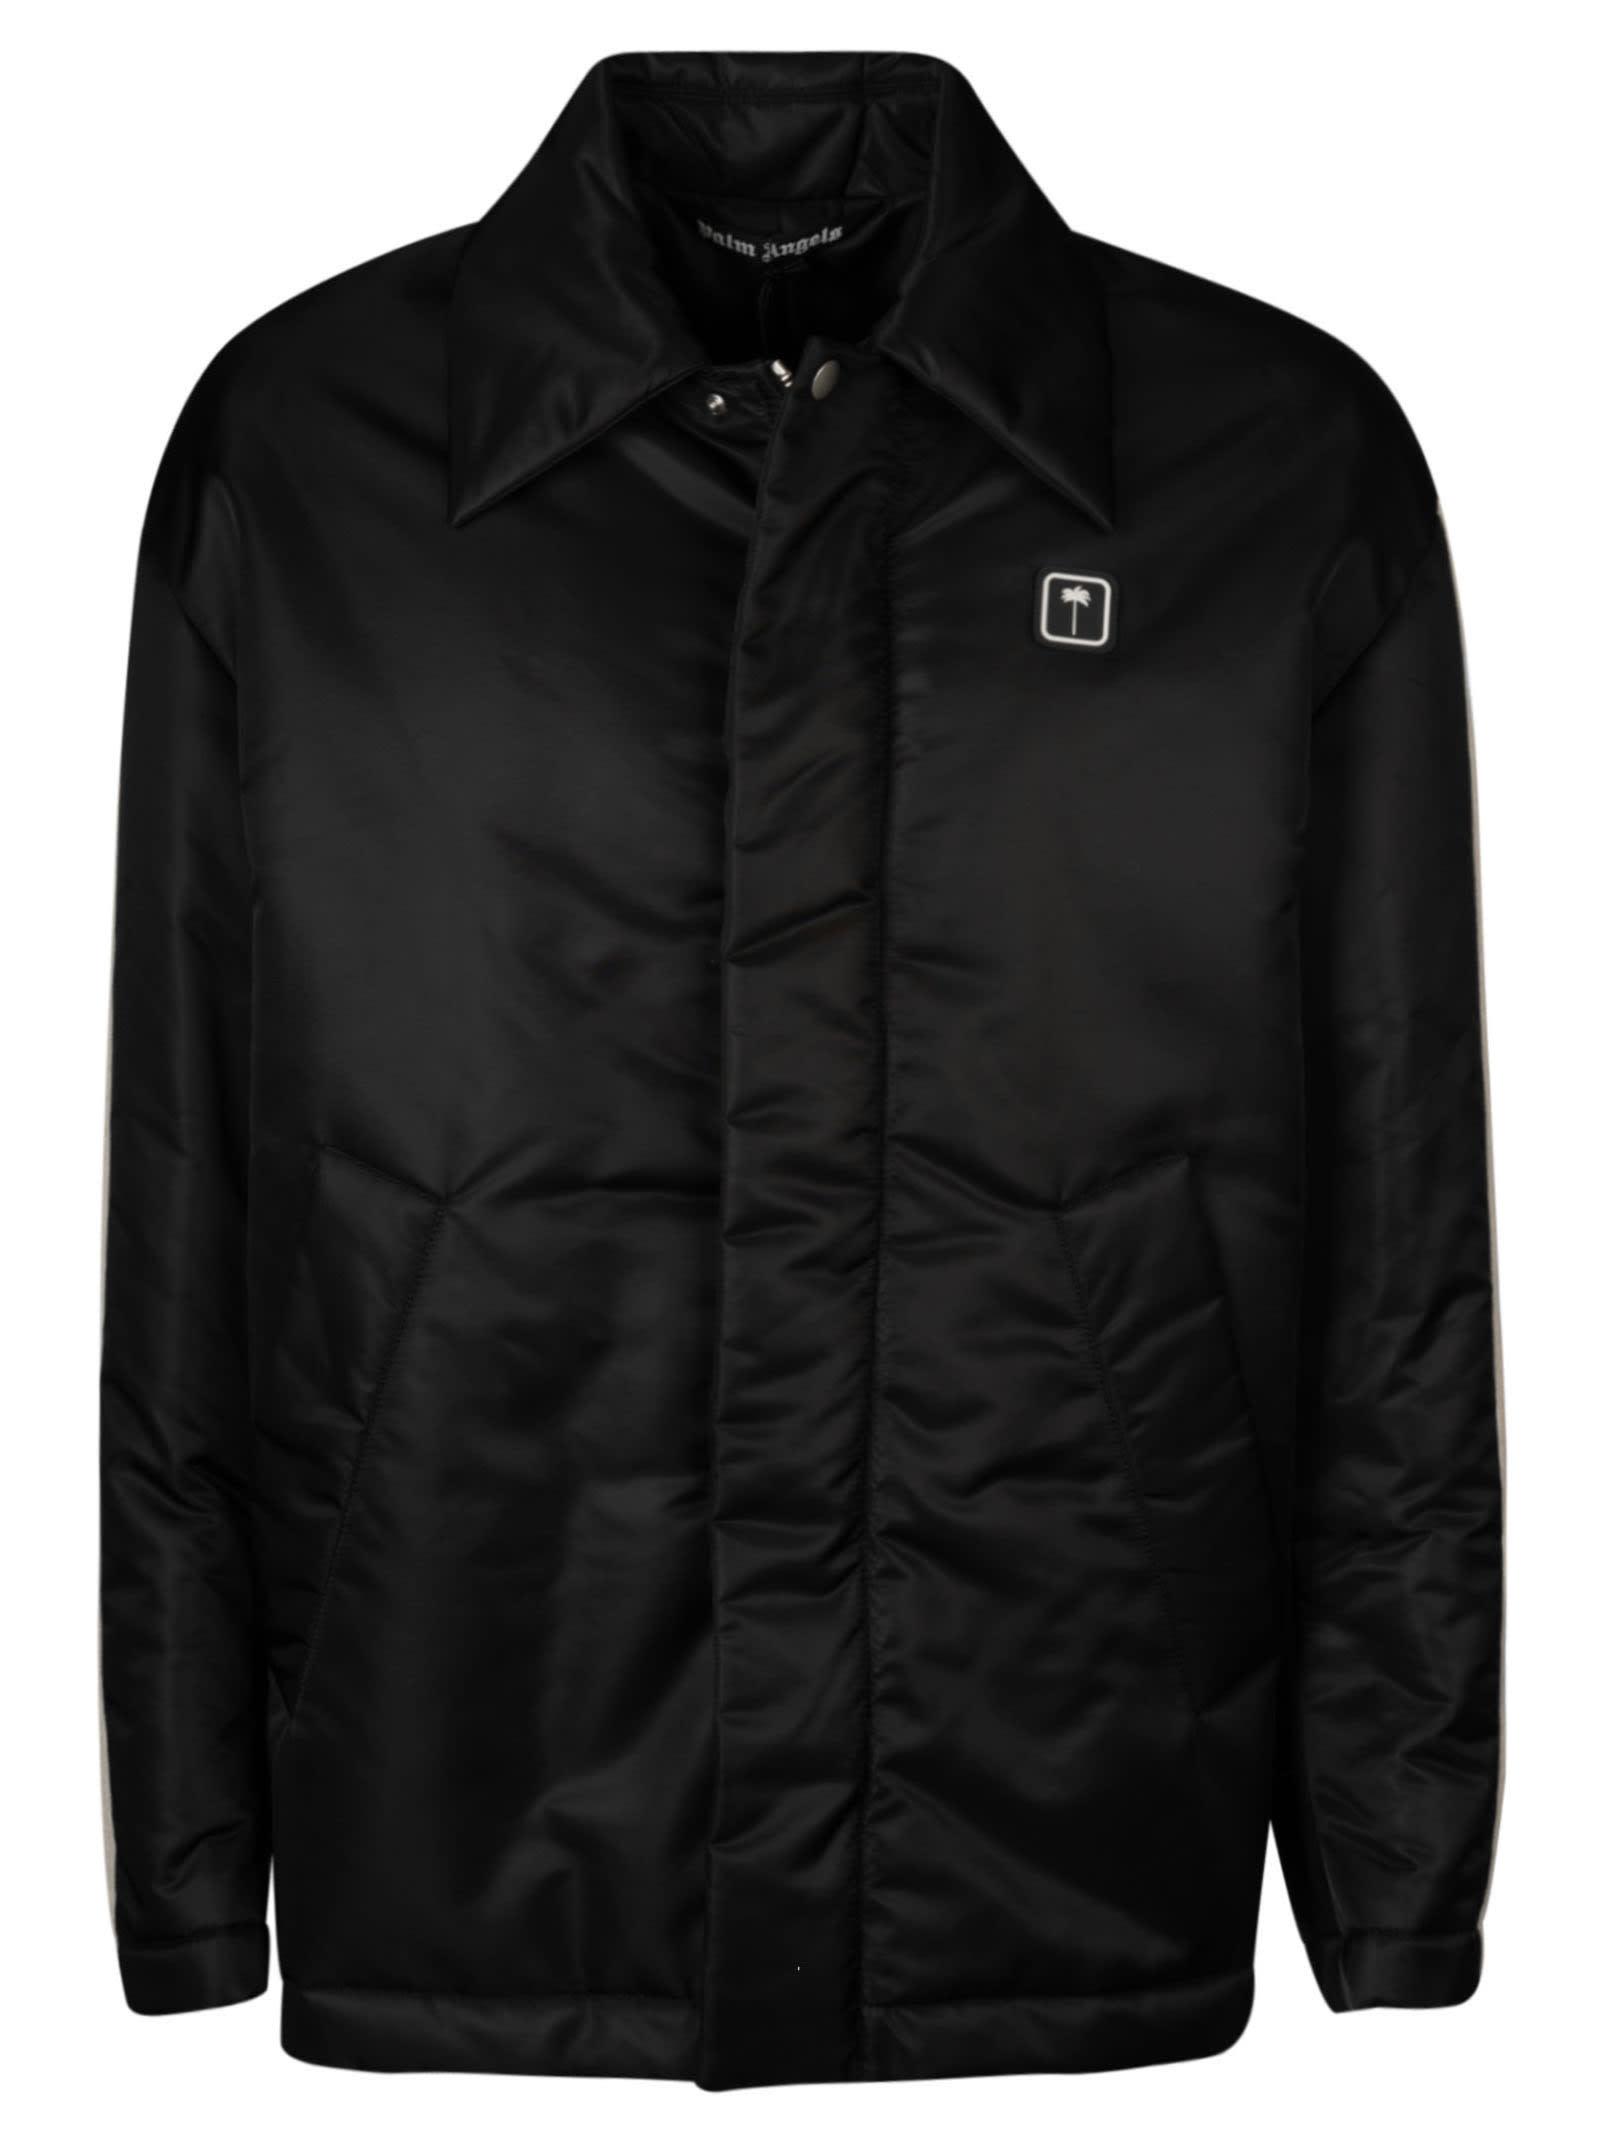 Palm Angels Pxp Puffer Jacket